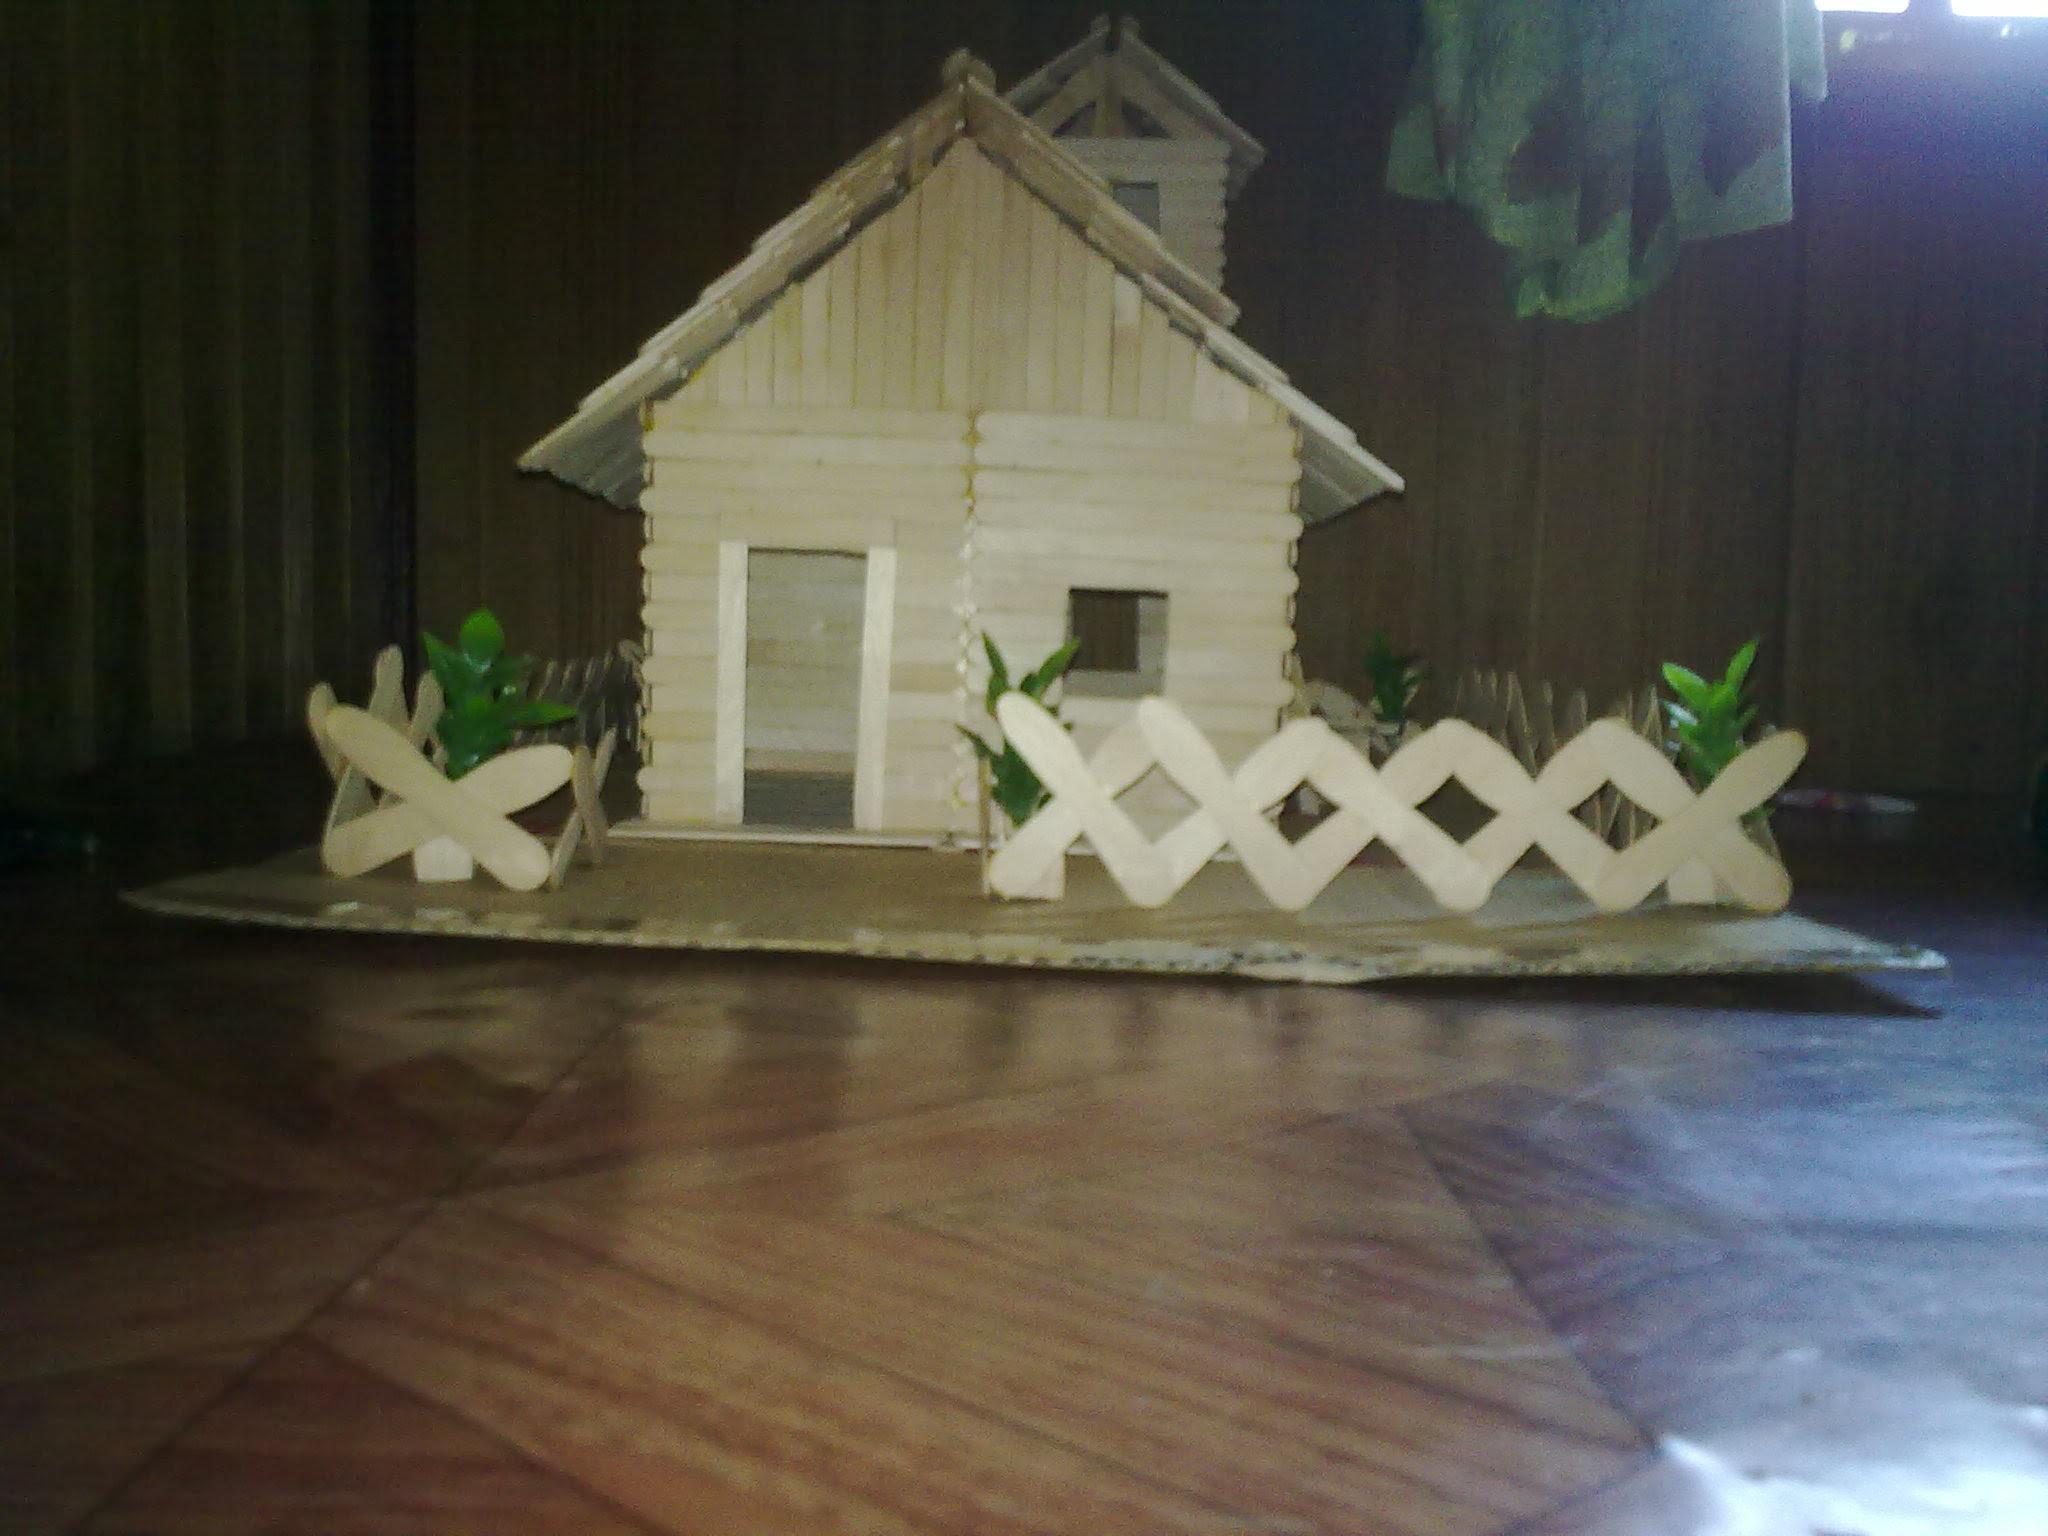 Miniatur Rumah Joglo Dari Stik Es Krim Goreng Info Wisata Hits Pagar dari stik es krim